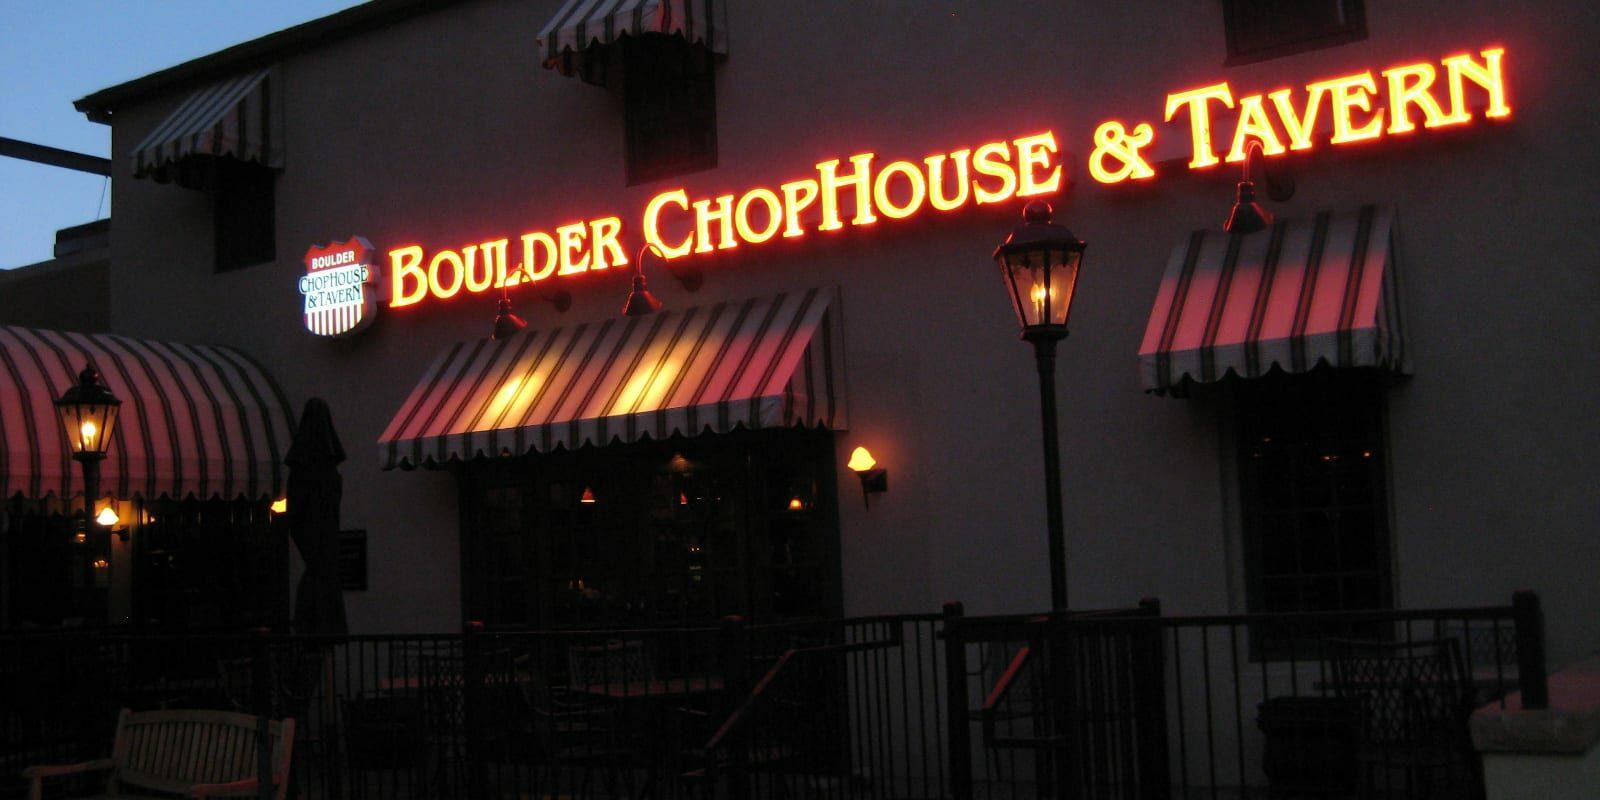 Boulder Chophouse and Tavern